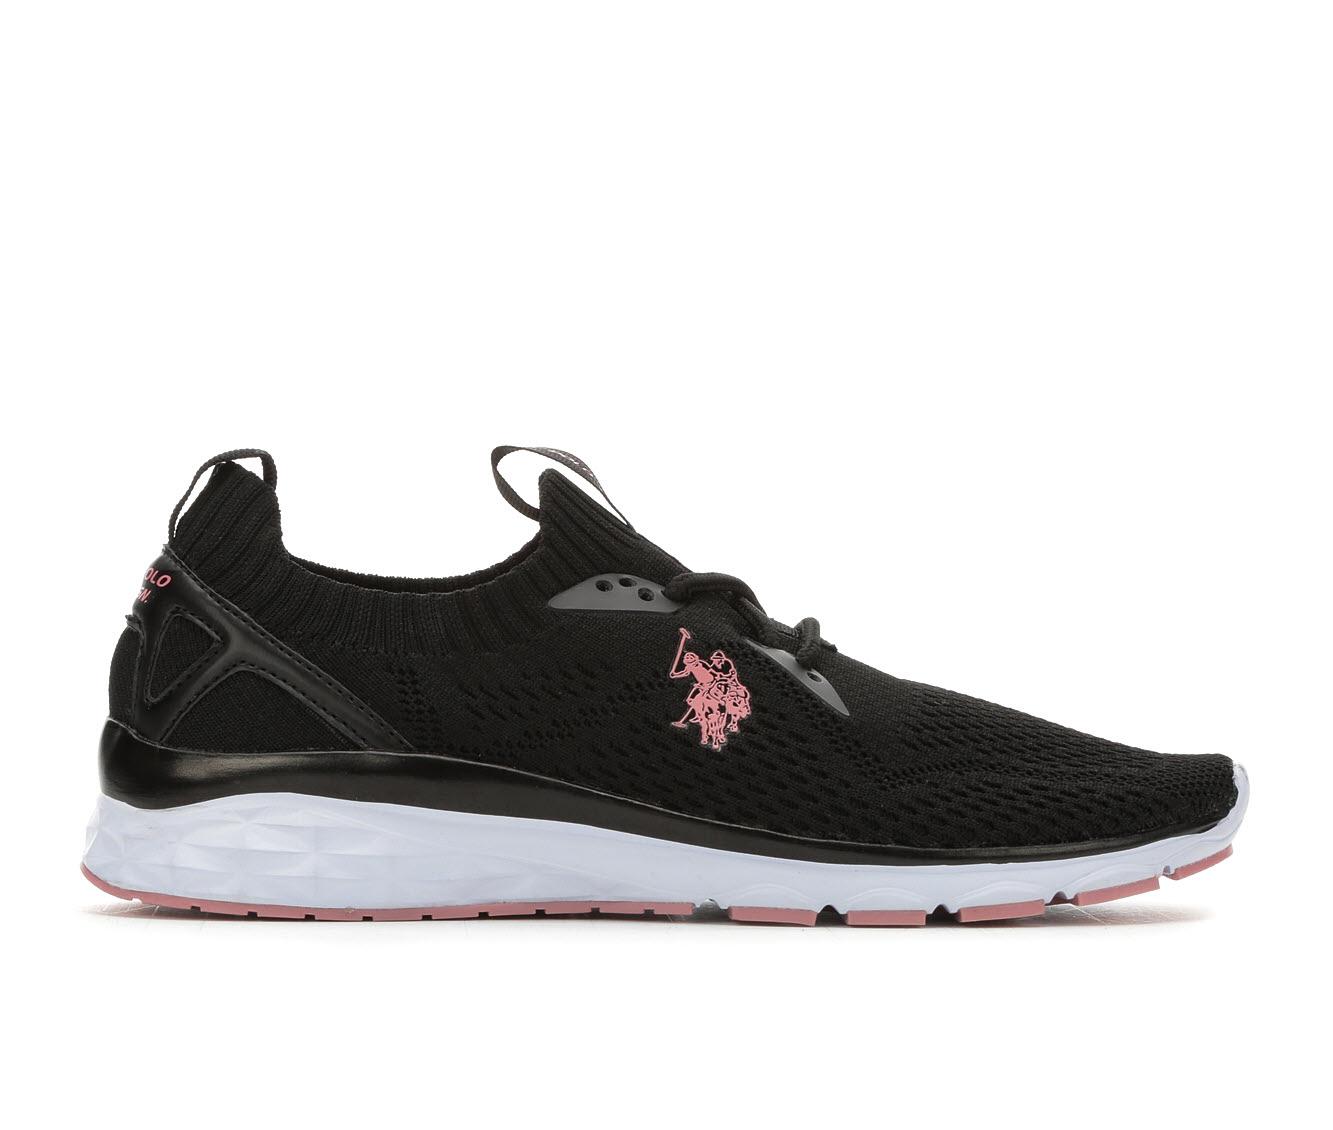 US Polo Assn Lazz Women's Athletic Shoe (Black)